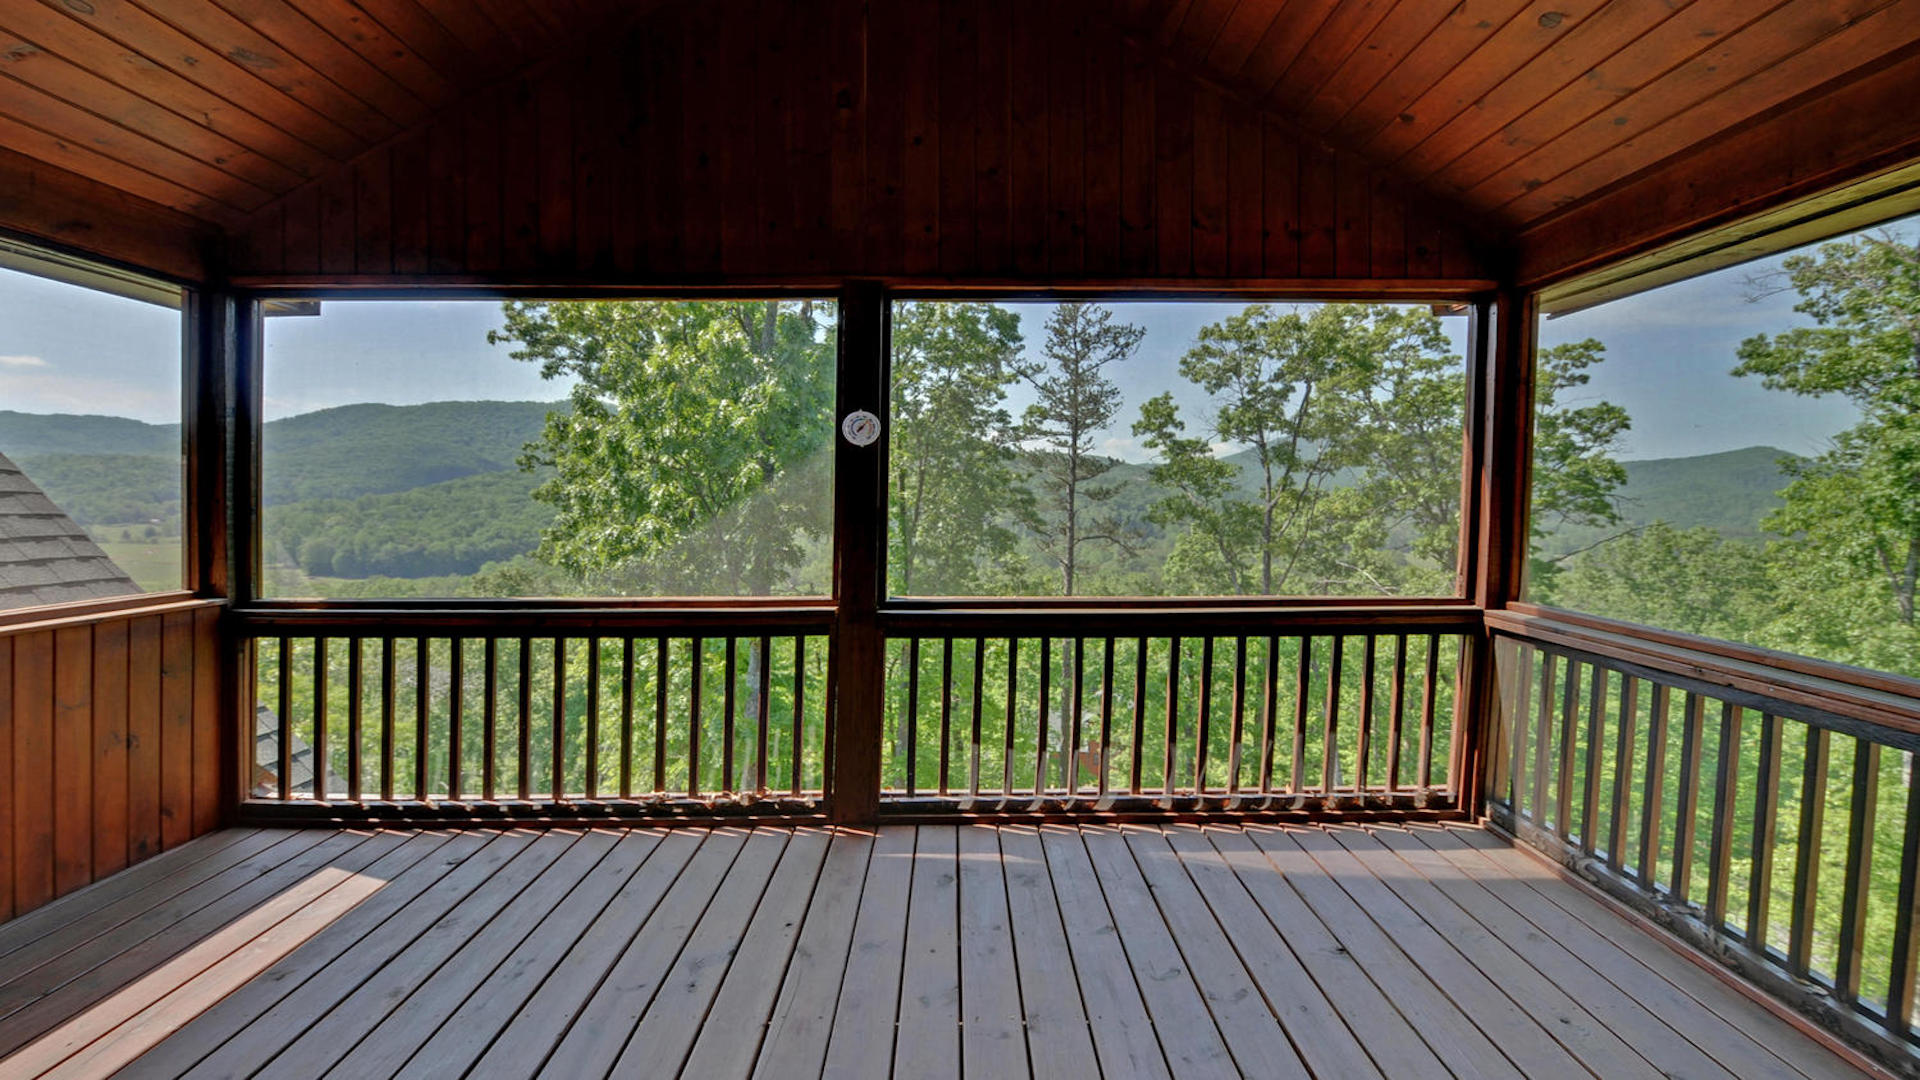 Big Sky View Rental Cabin Blue Ridge Ga